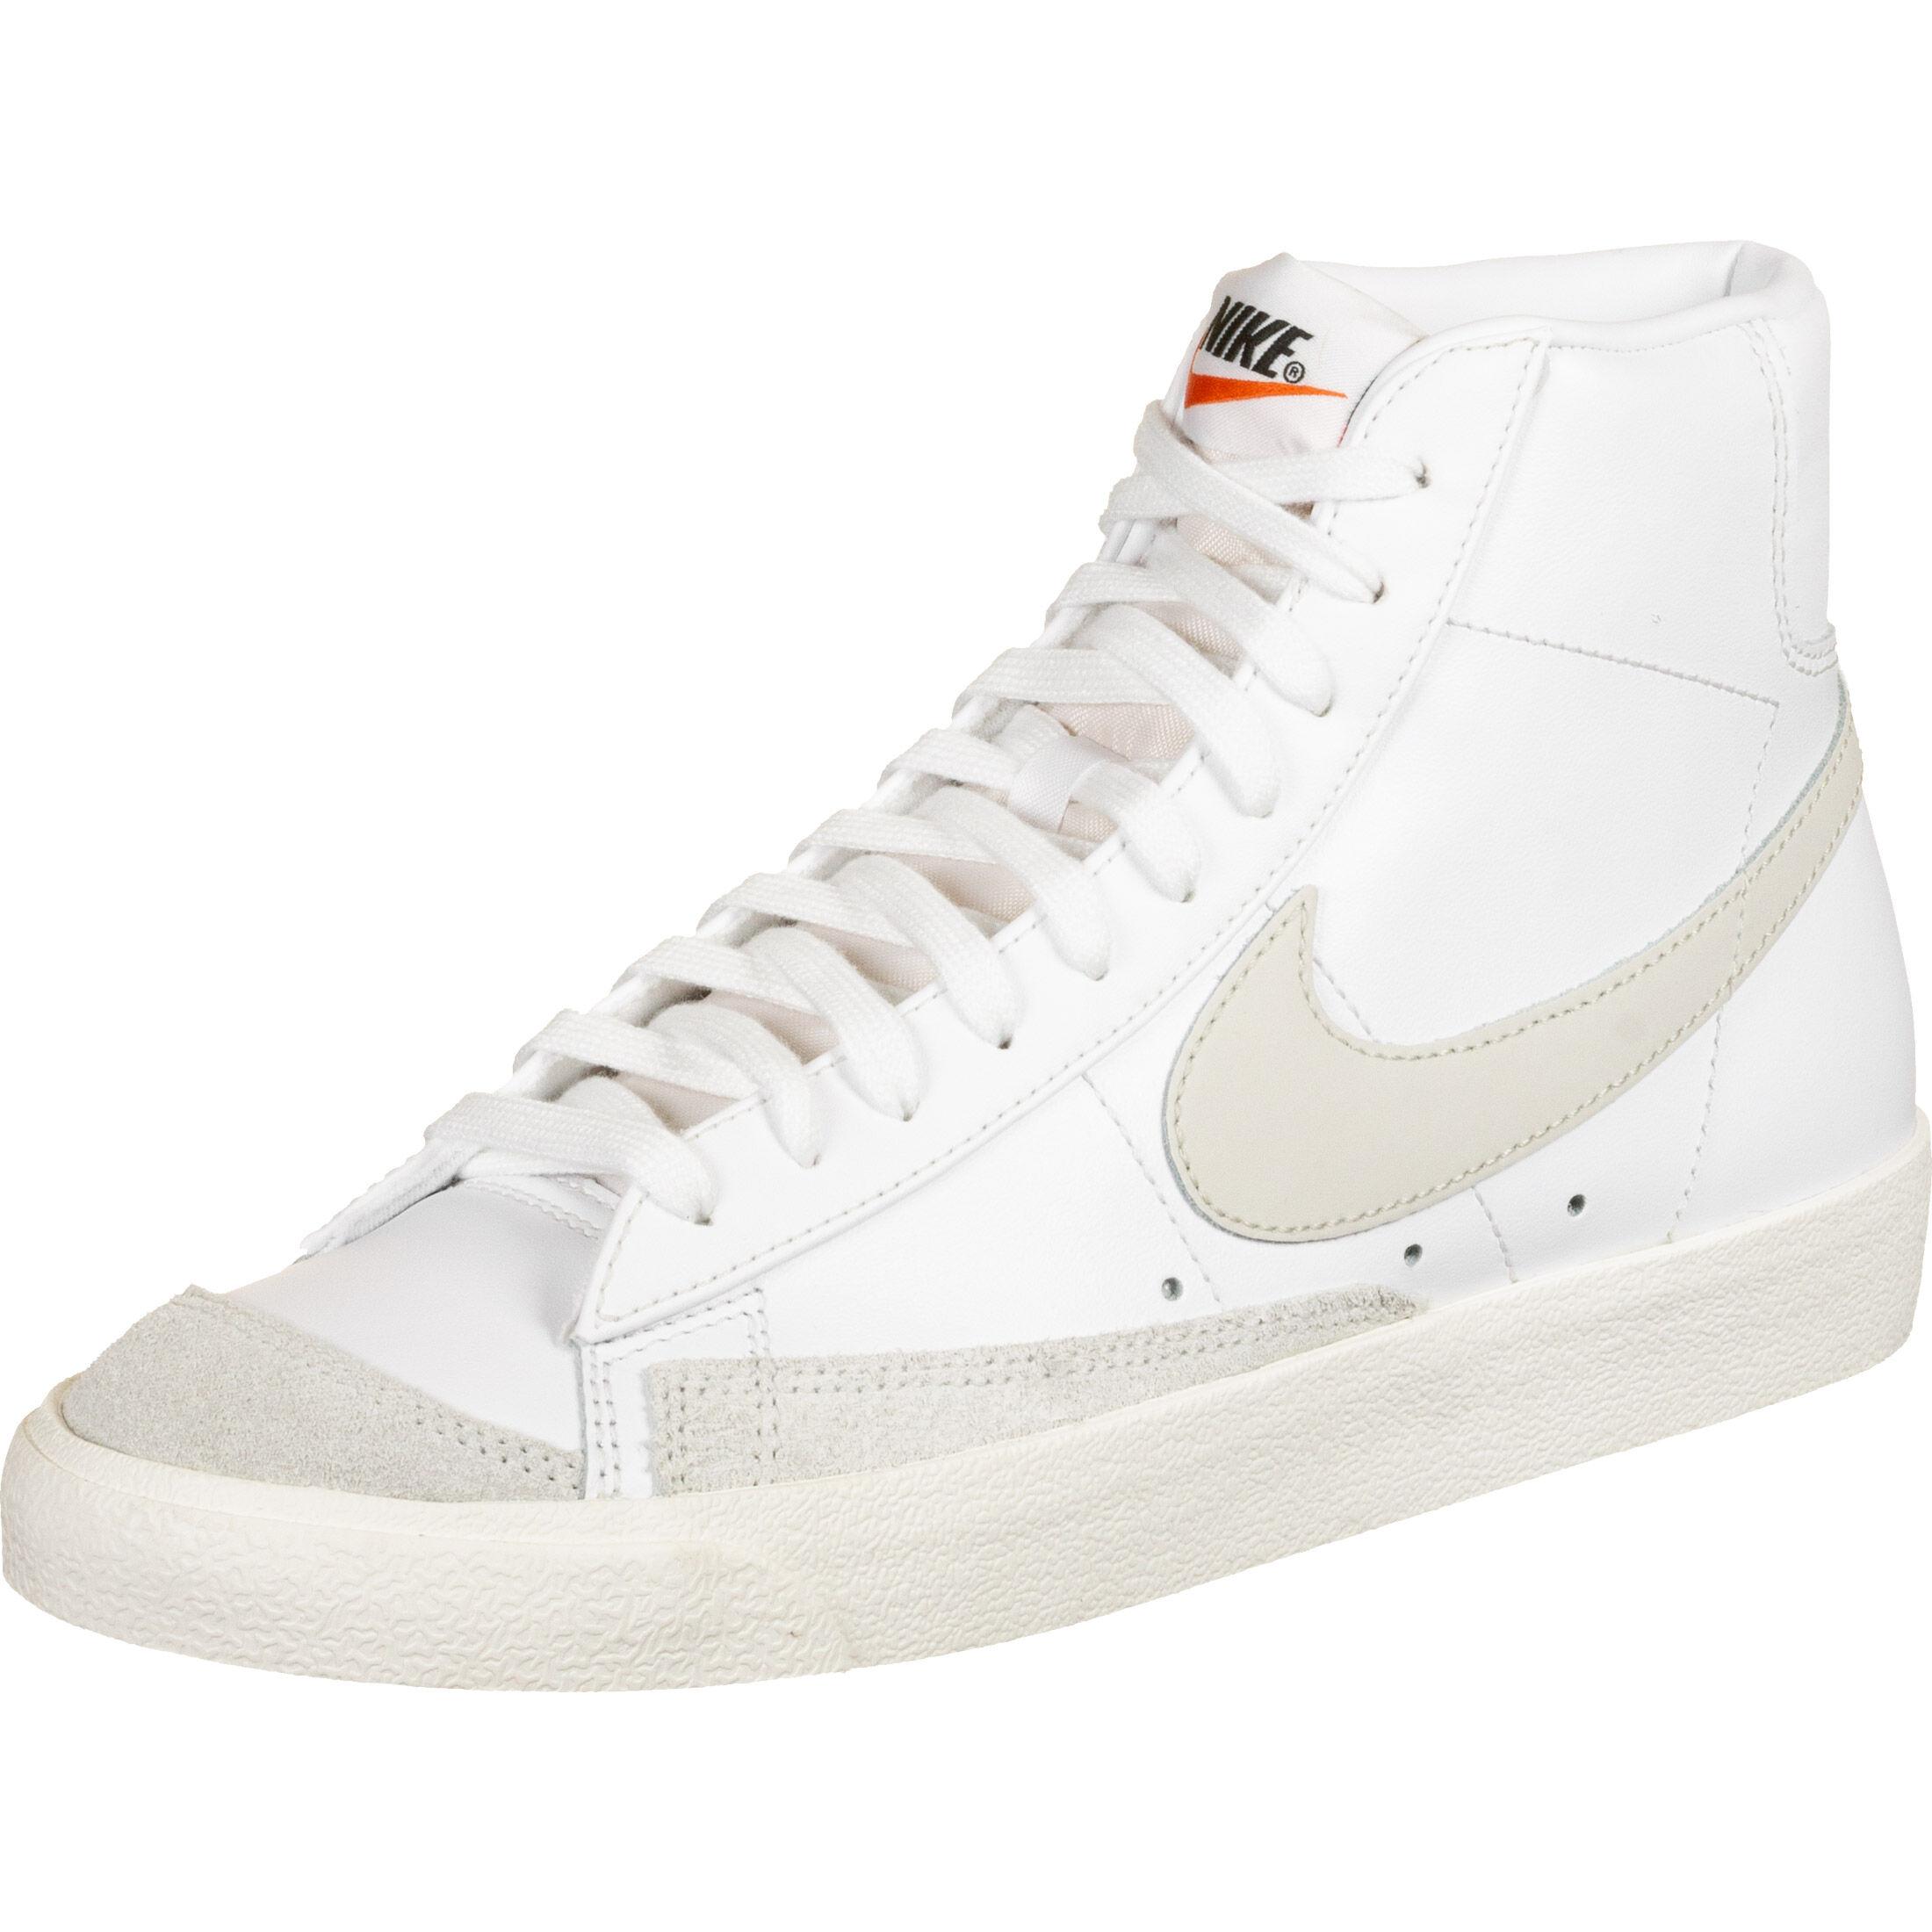 Nike Blazer Mid 77 Vintage - Basketball at Stylefile